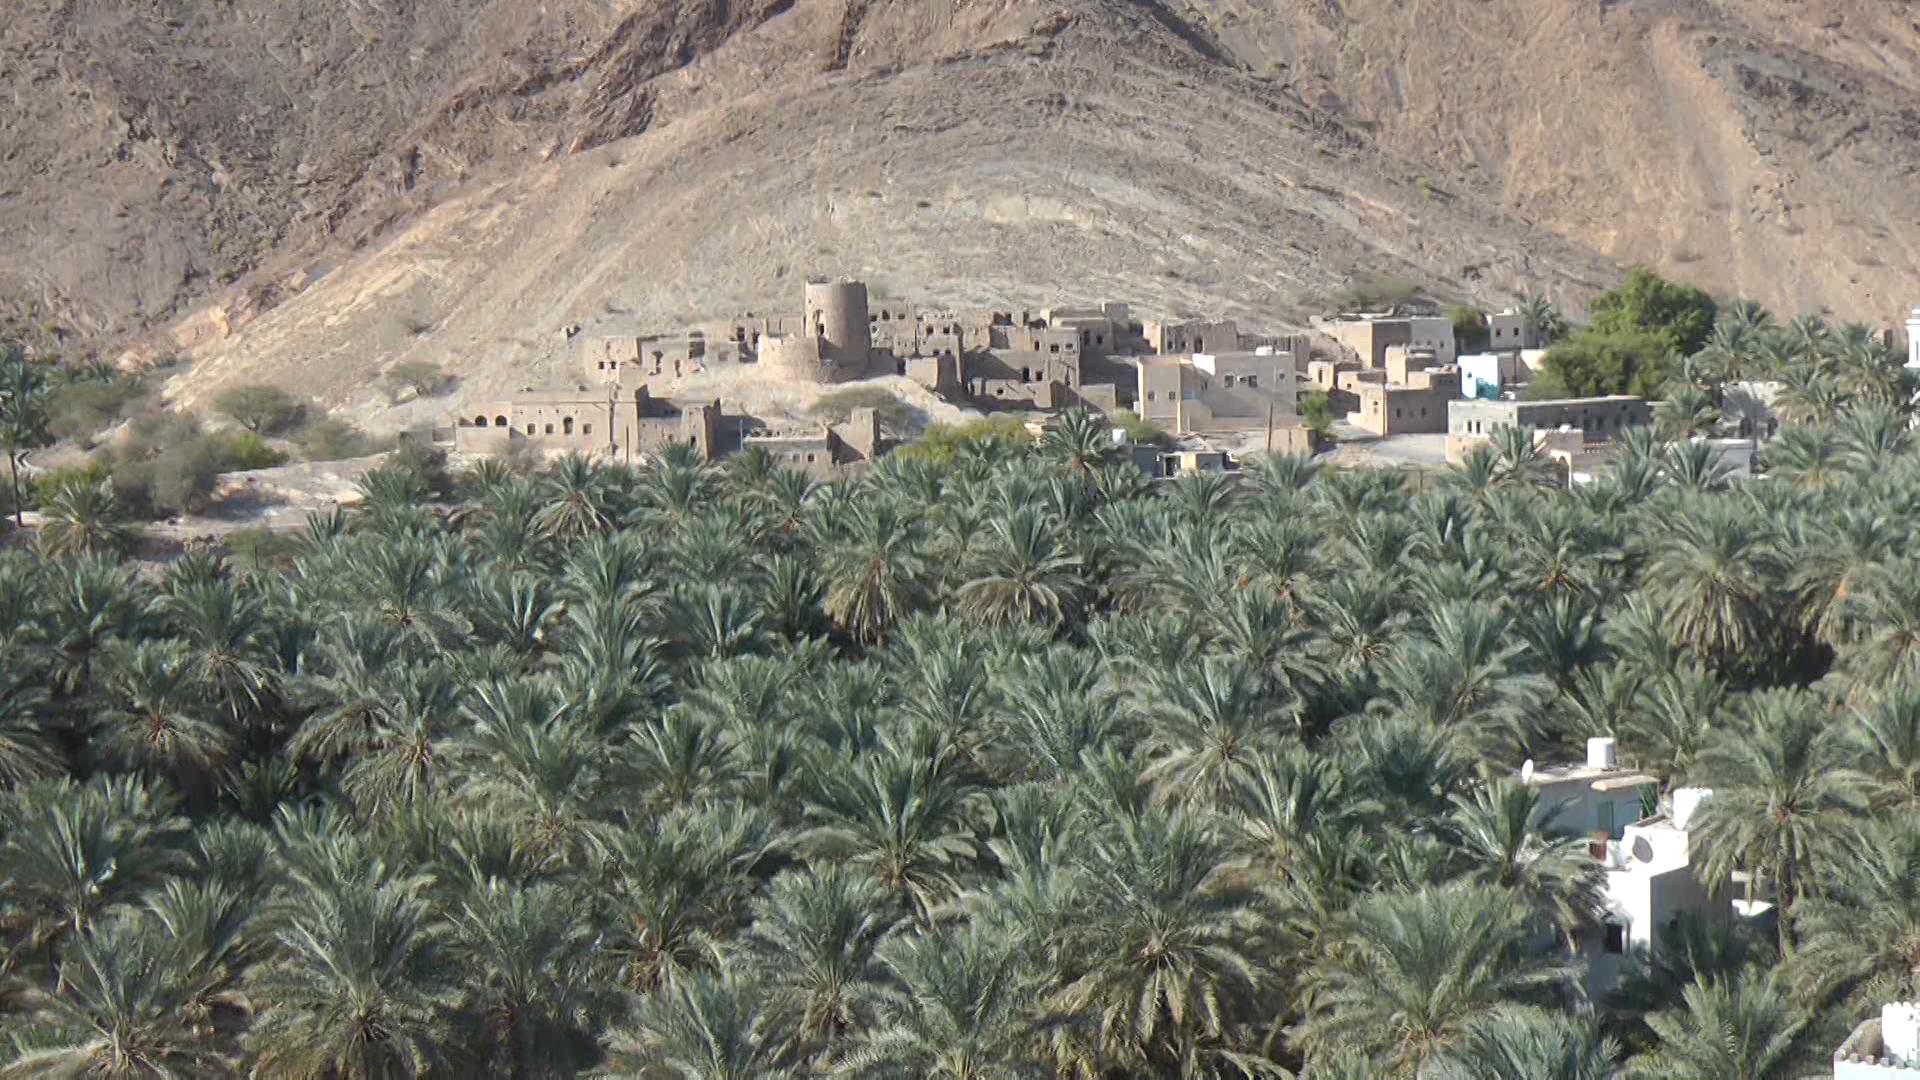 REISE-Logovid Oman Oase 2